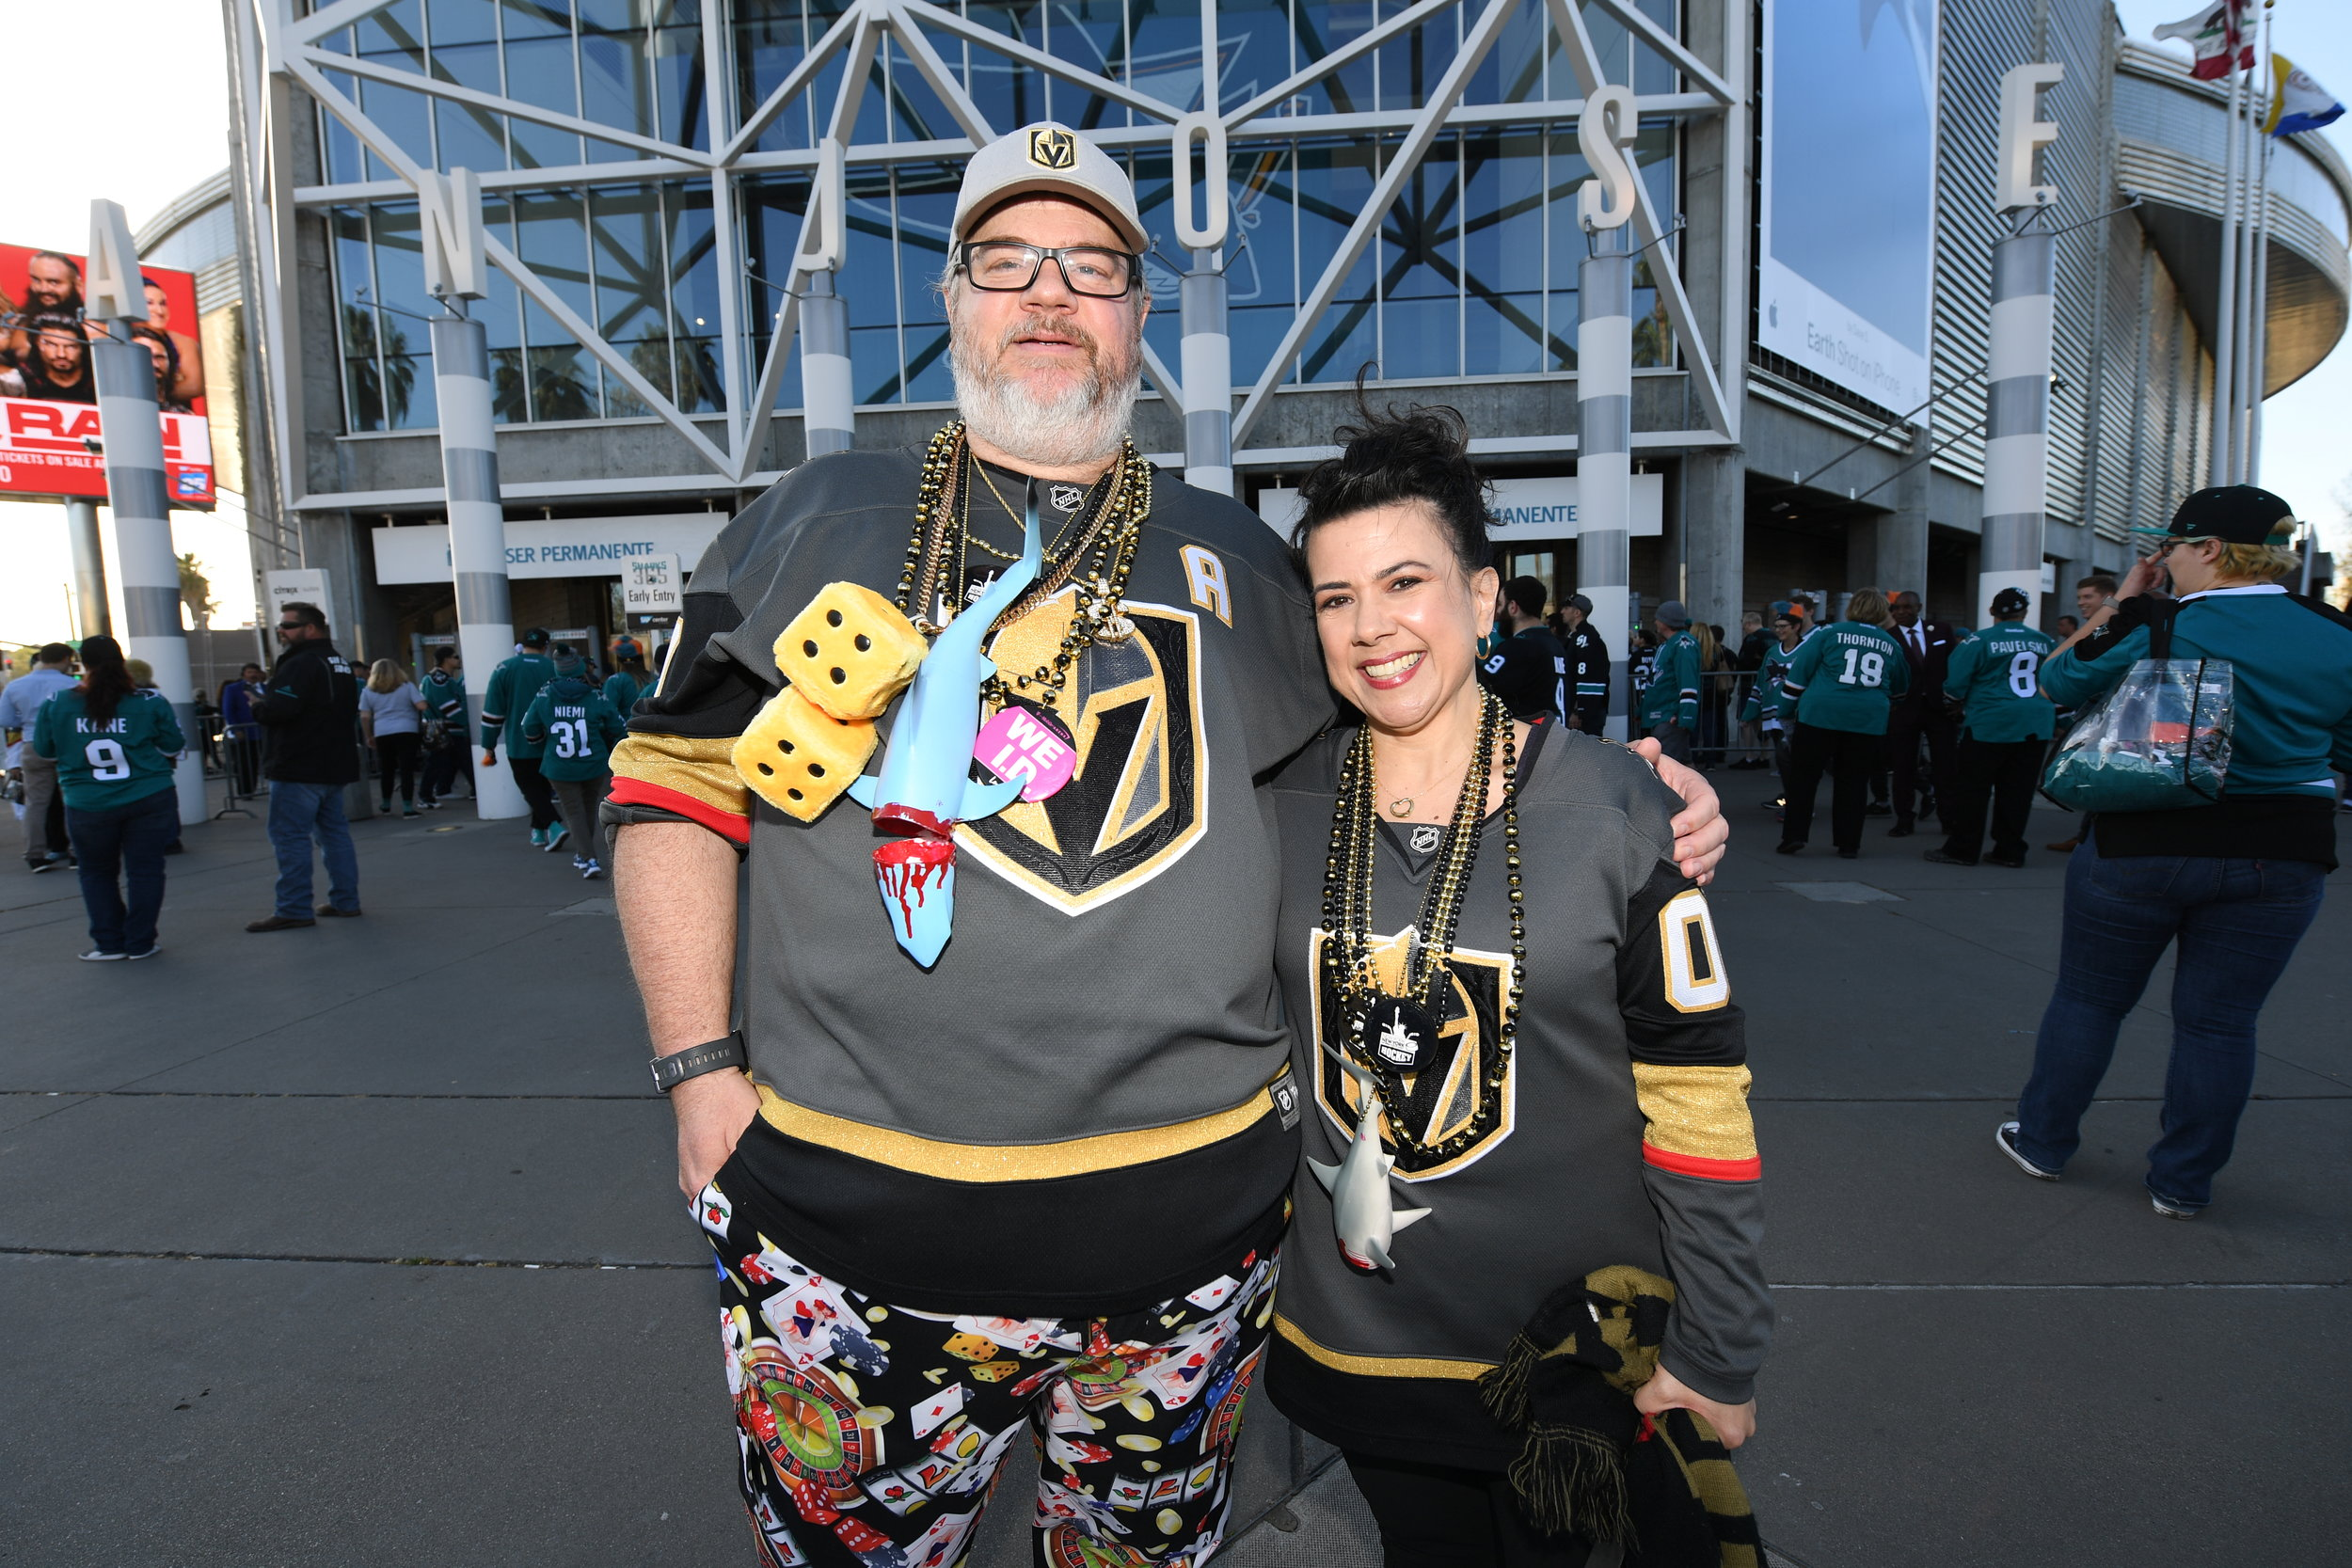 NHL_2019-04-10_0013.JPG